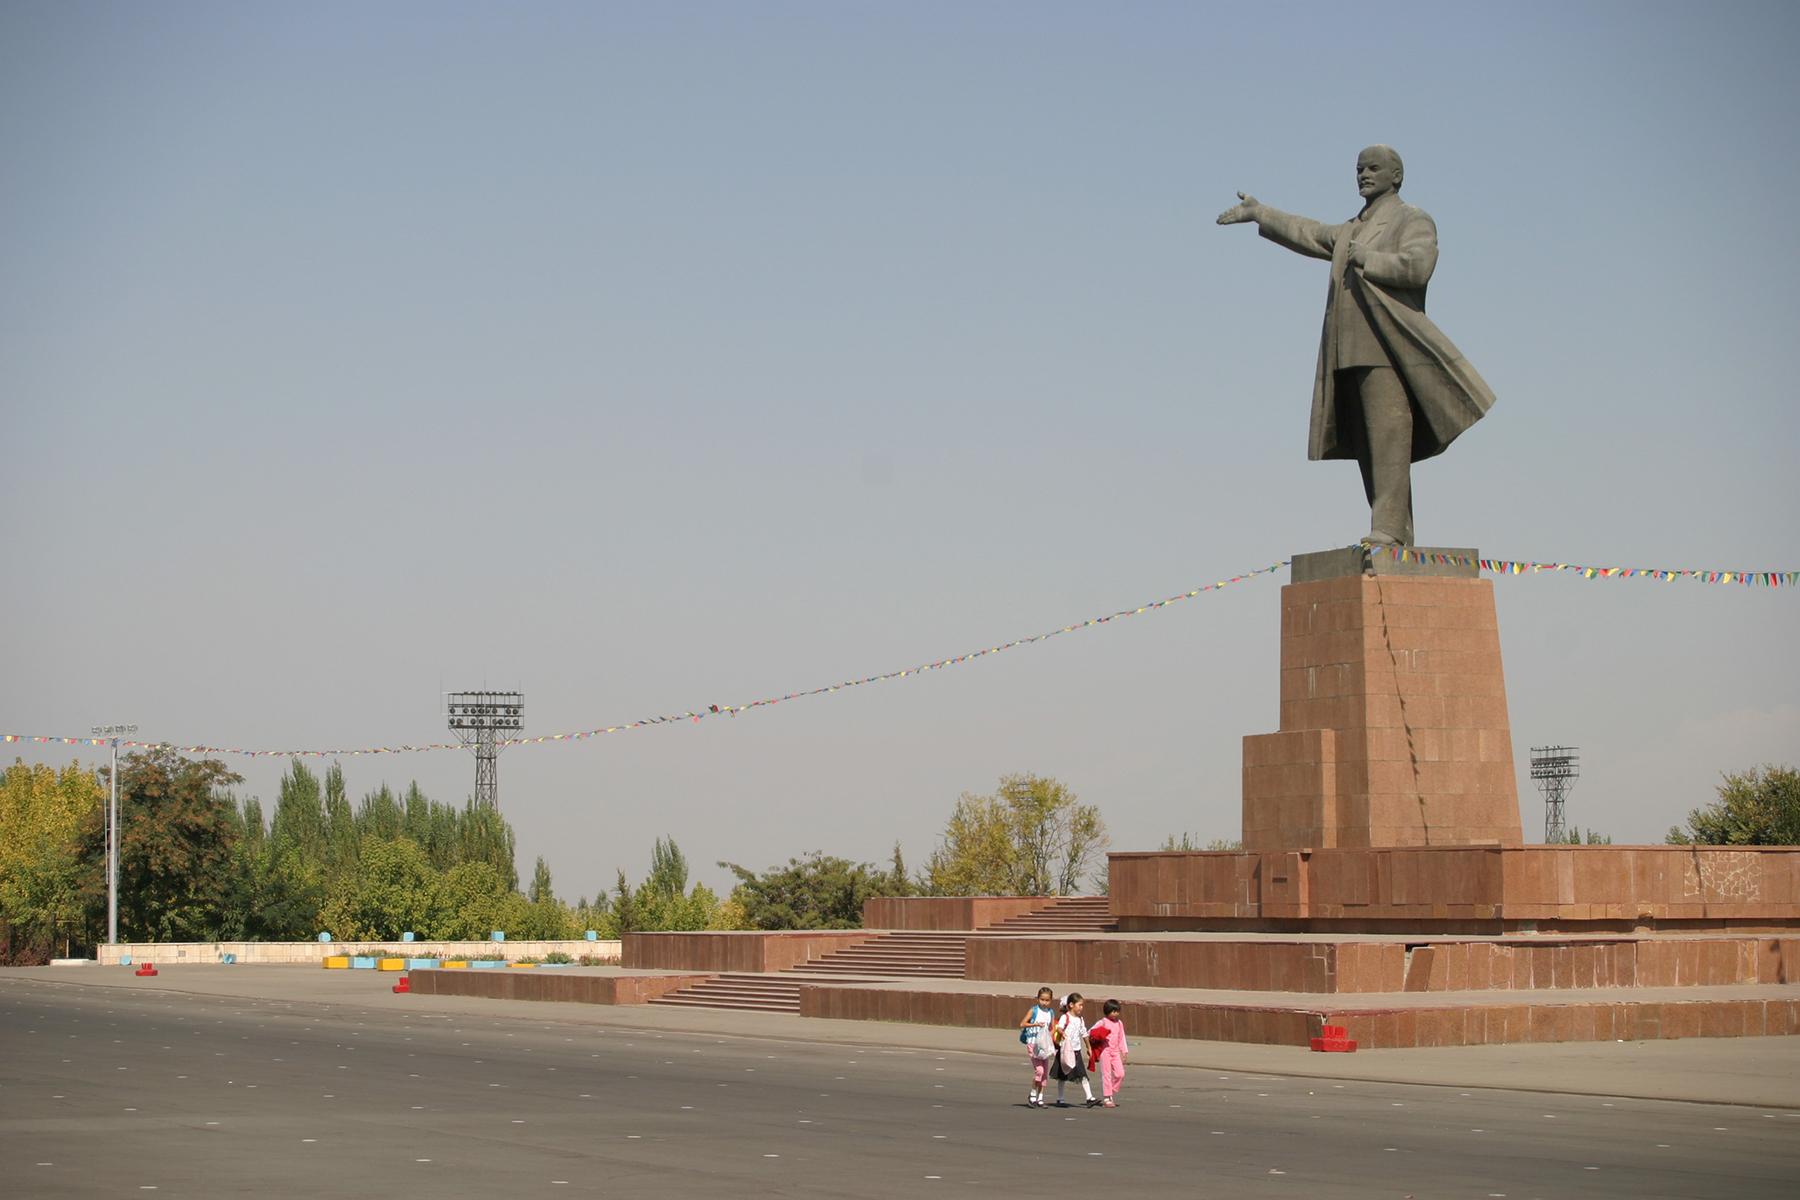 Lenin lässt grüßen, Osh, Kirgistan, 2006